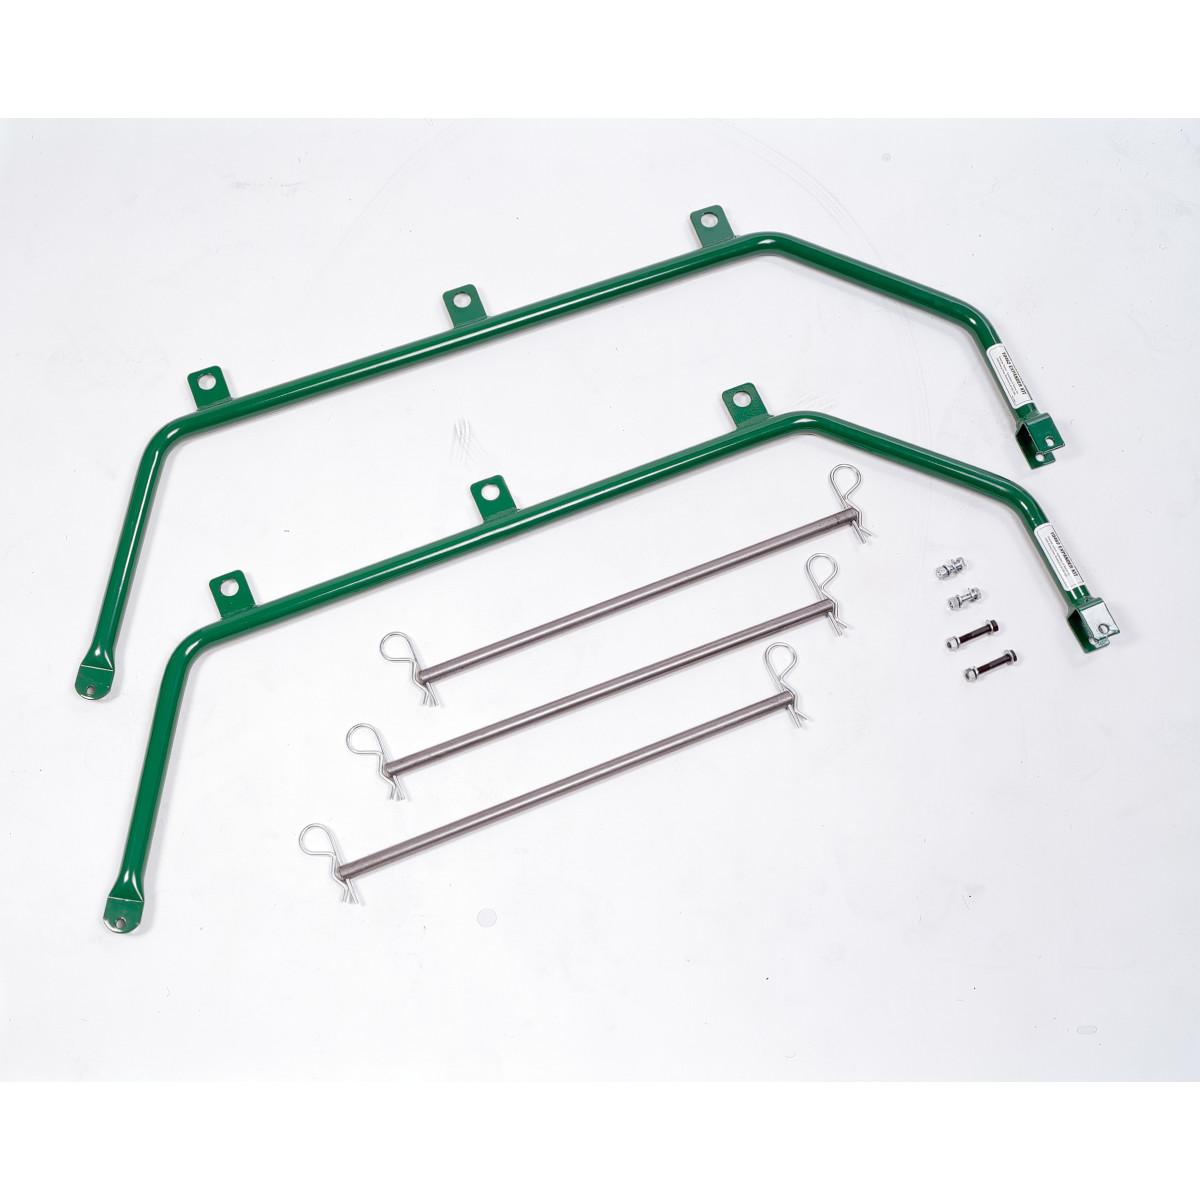 Greenlee 10462 Expander Kit (10462)